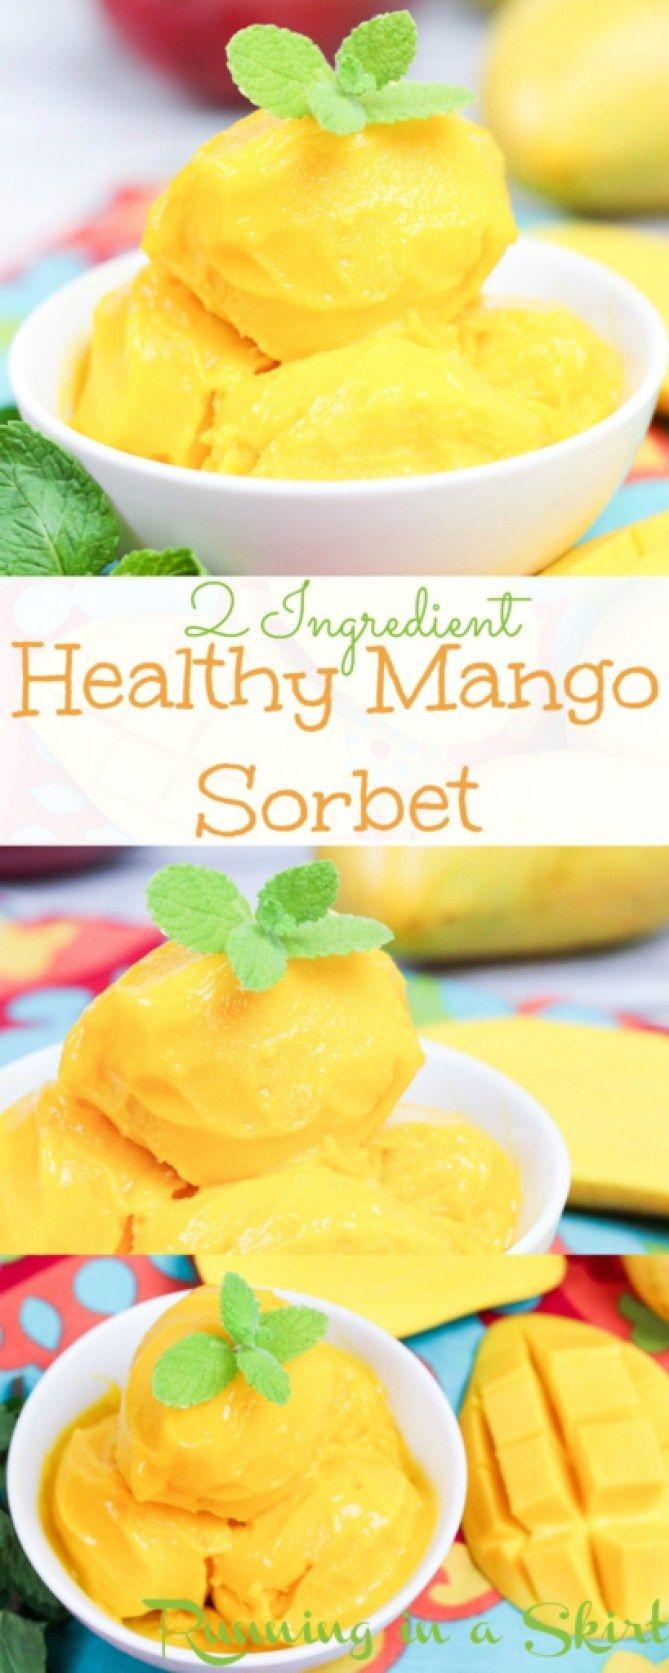 Healthy Mango Recipes  2 Ingre nt Healthy Mango Sorbet recipe This easy and